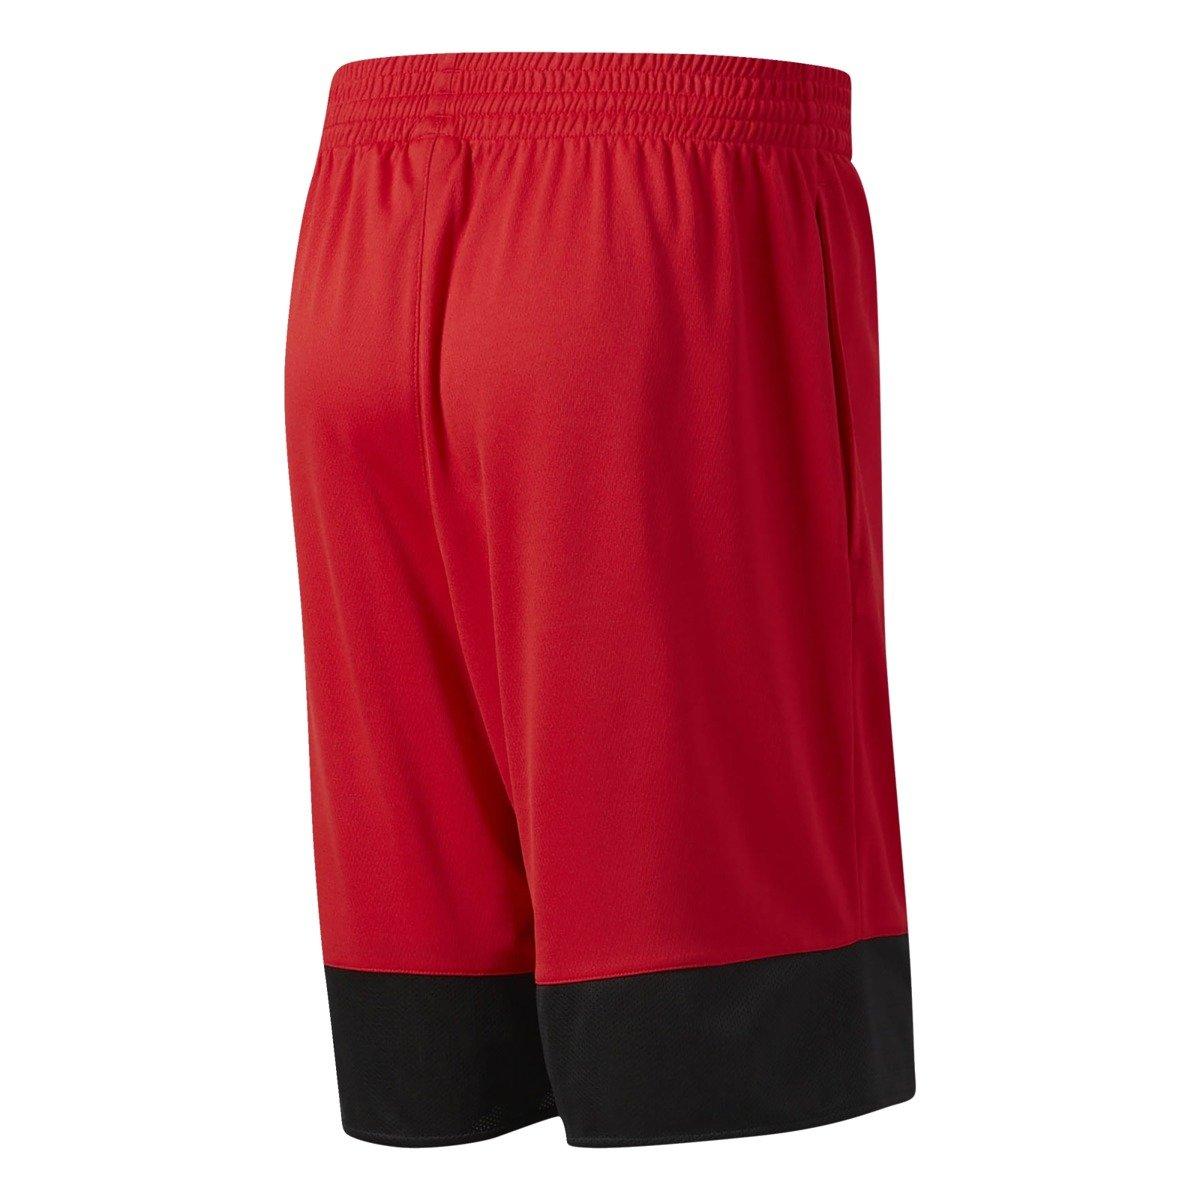 adidas houston rockets basketball shorts b45415 czerwony